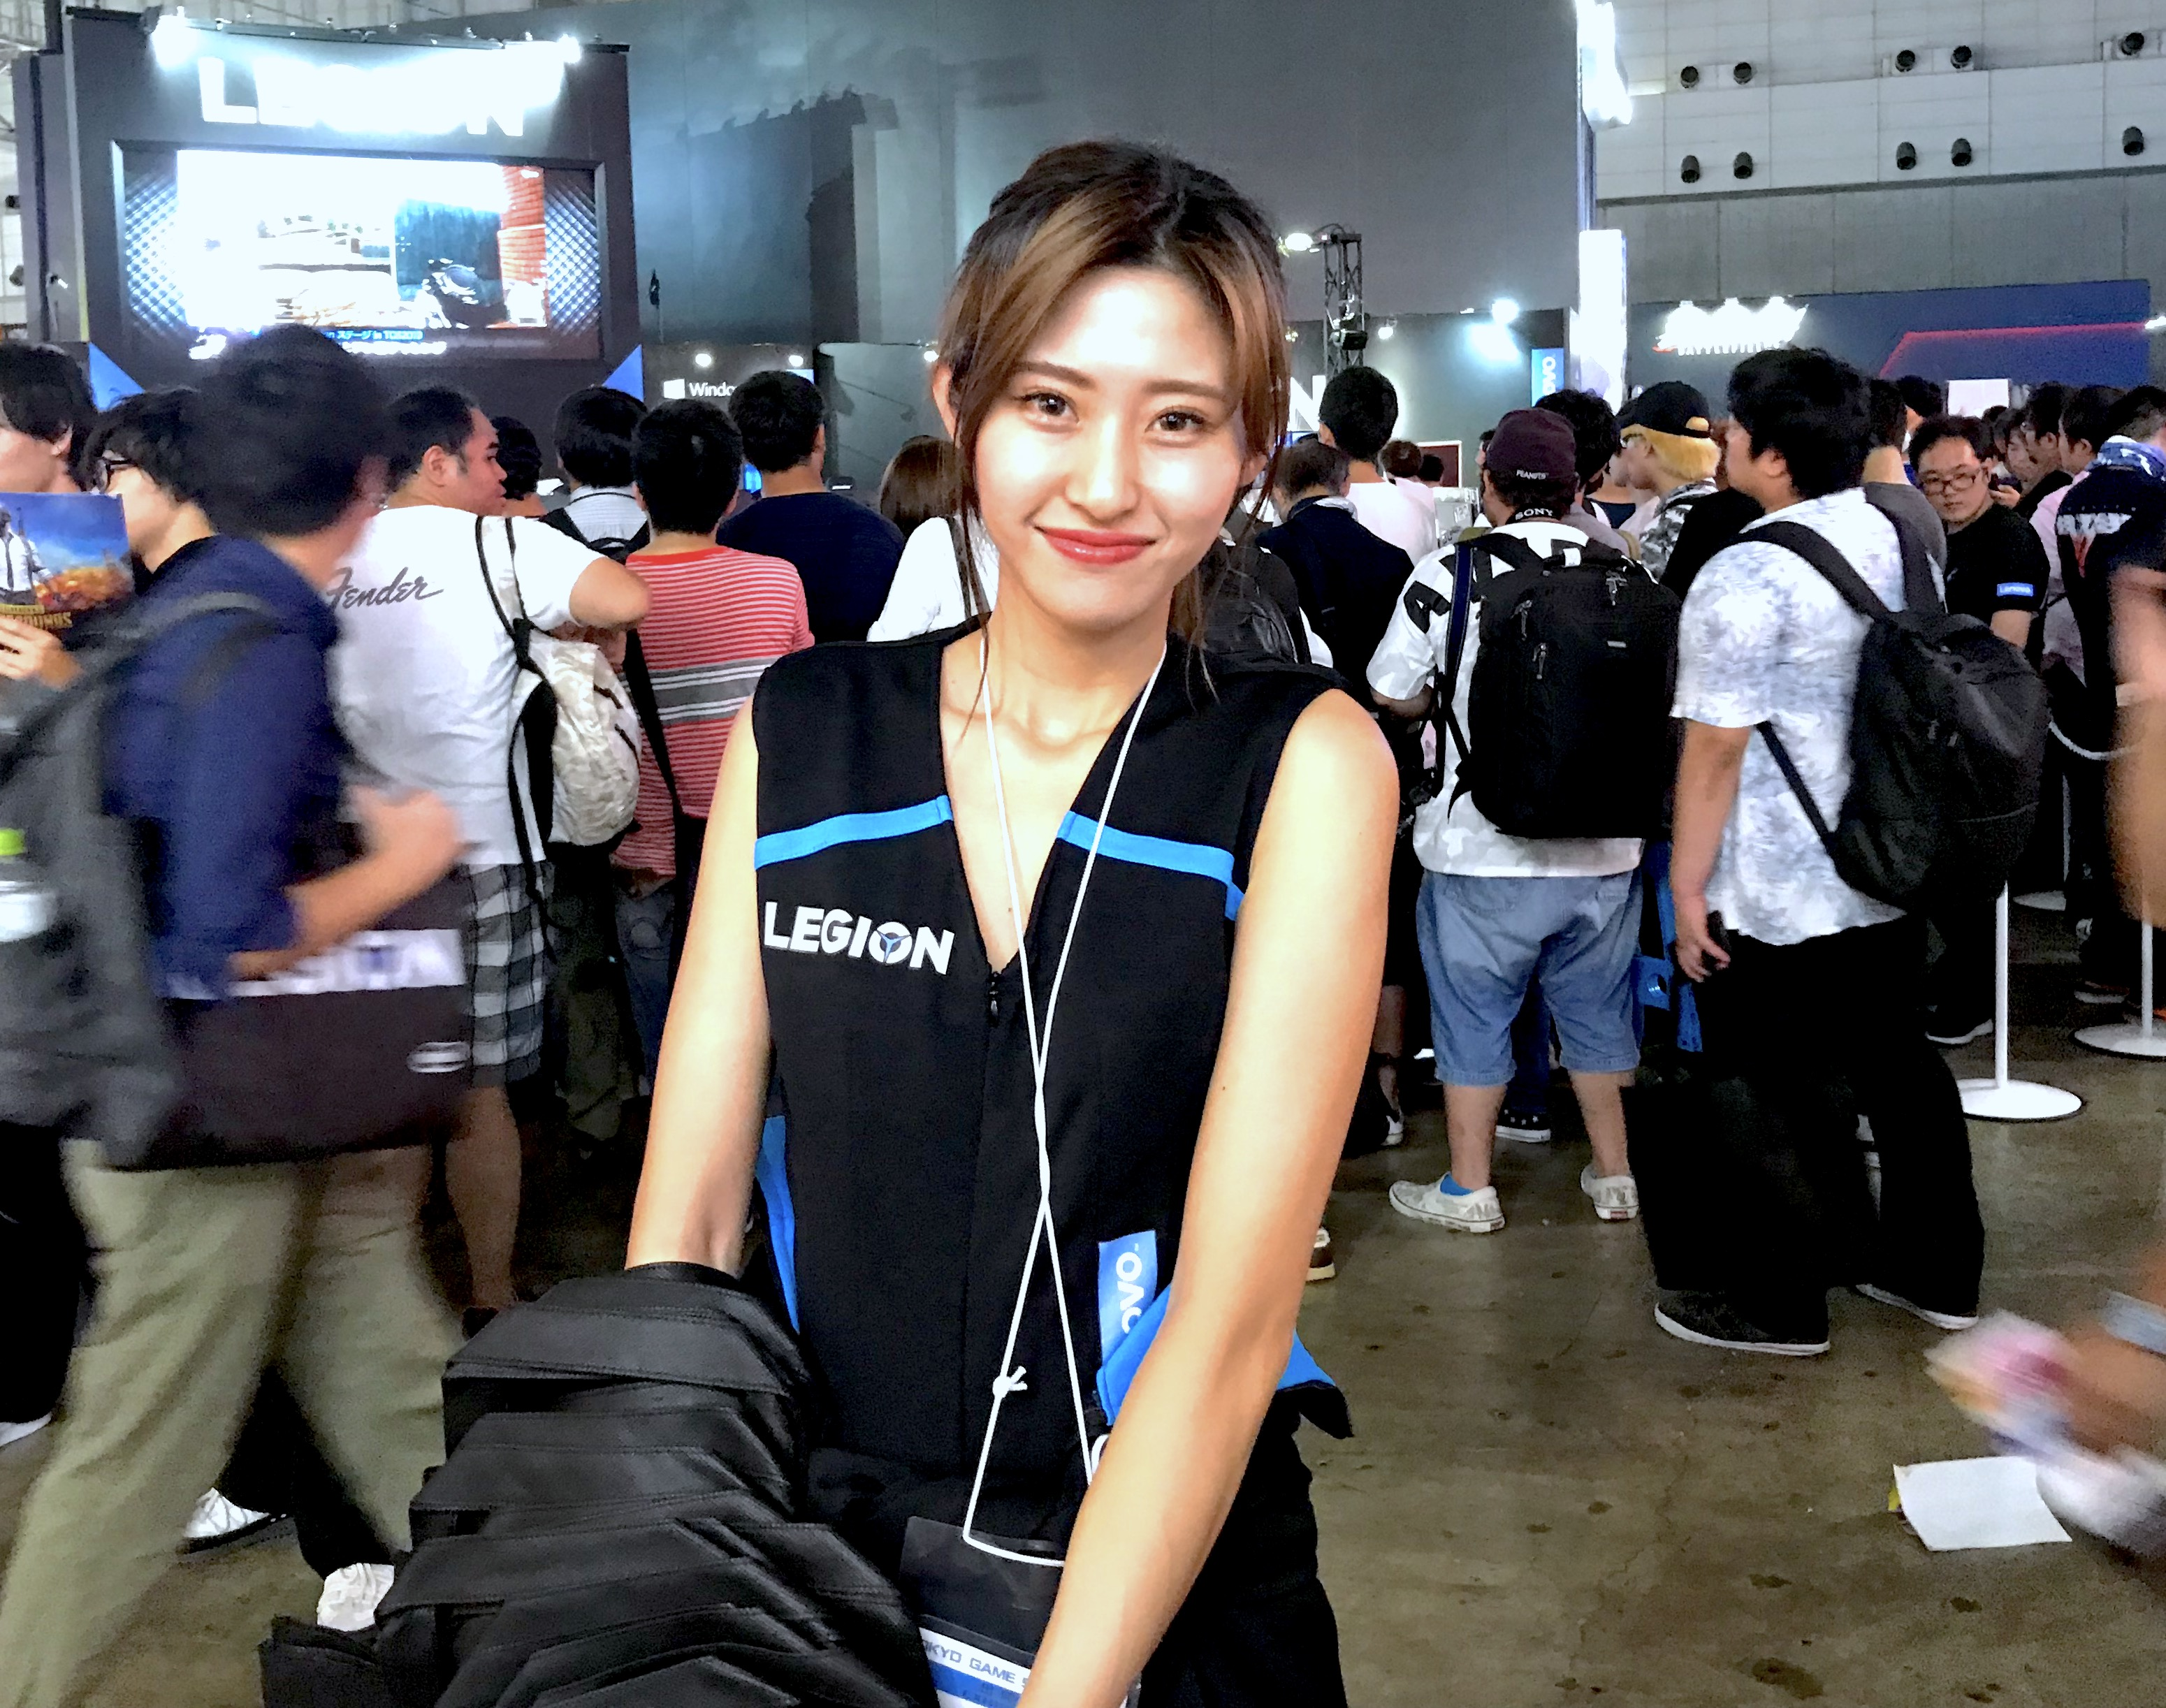 【TGS2019-美女レポートVol.3】可愛すぎるコンパニオン・コスプレイヤー達